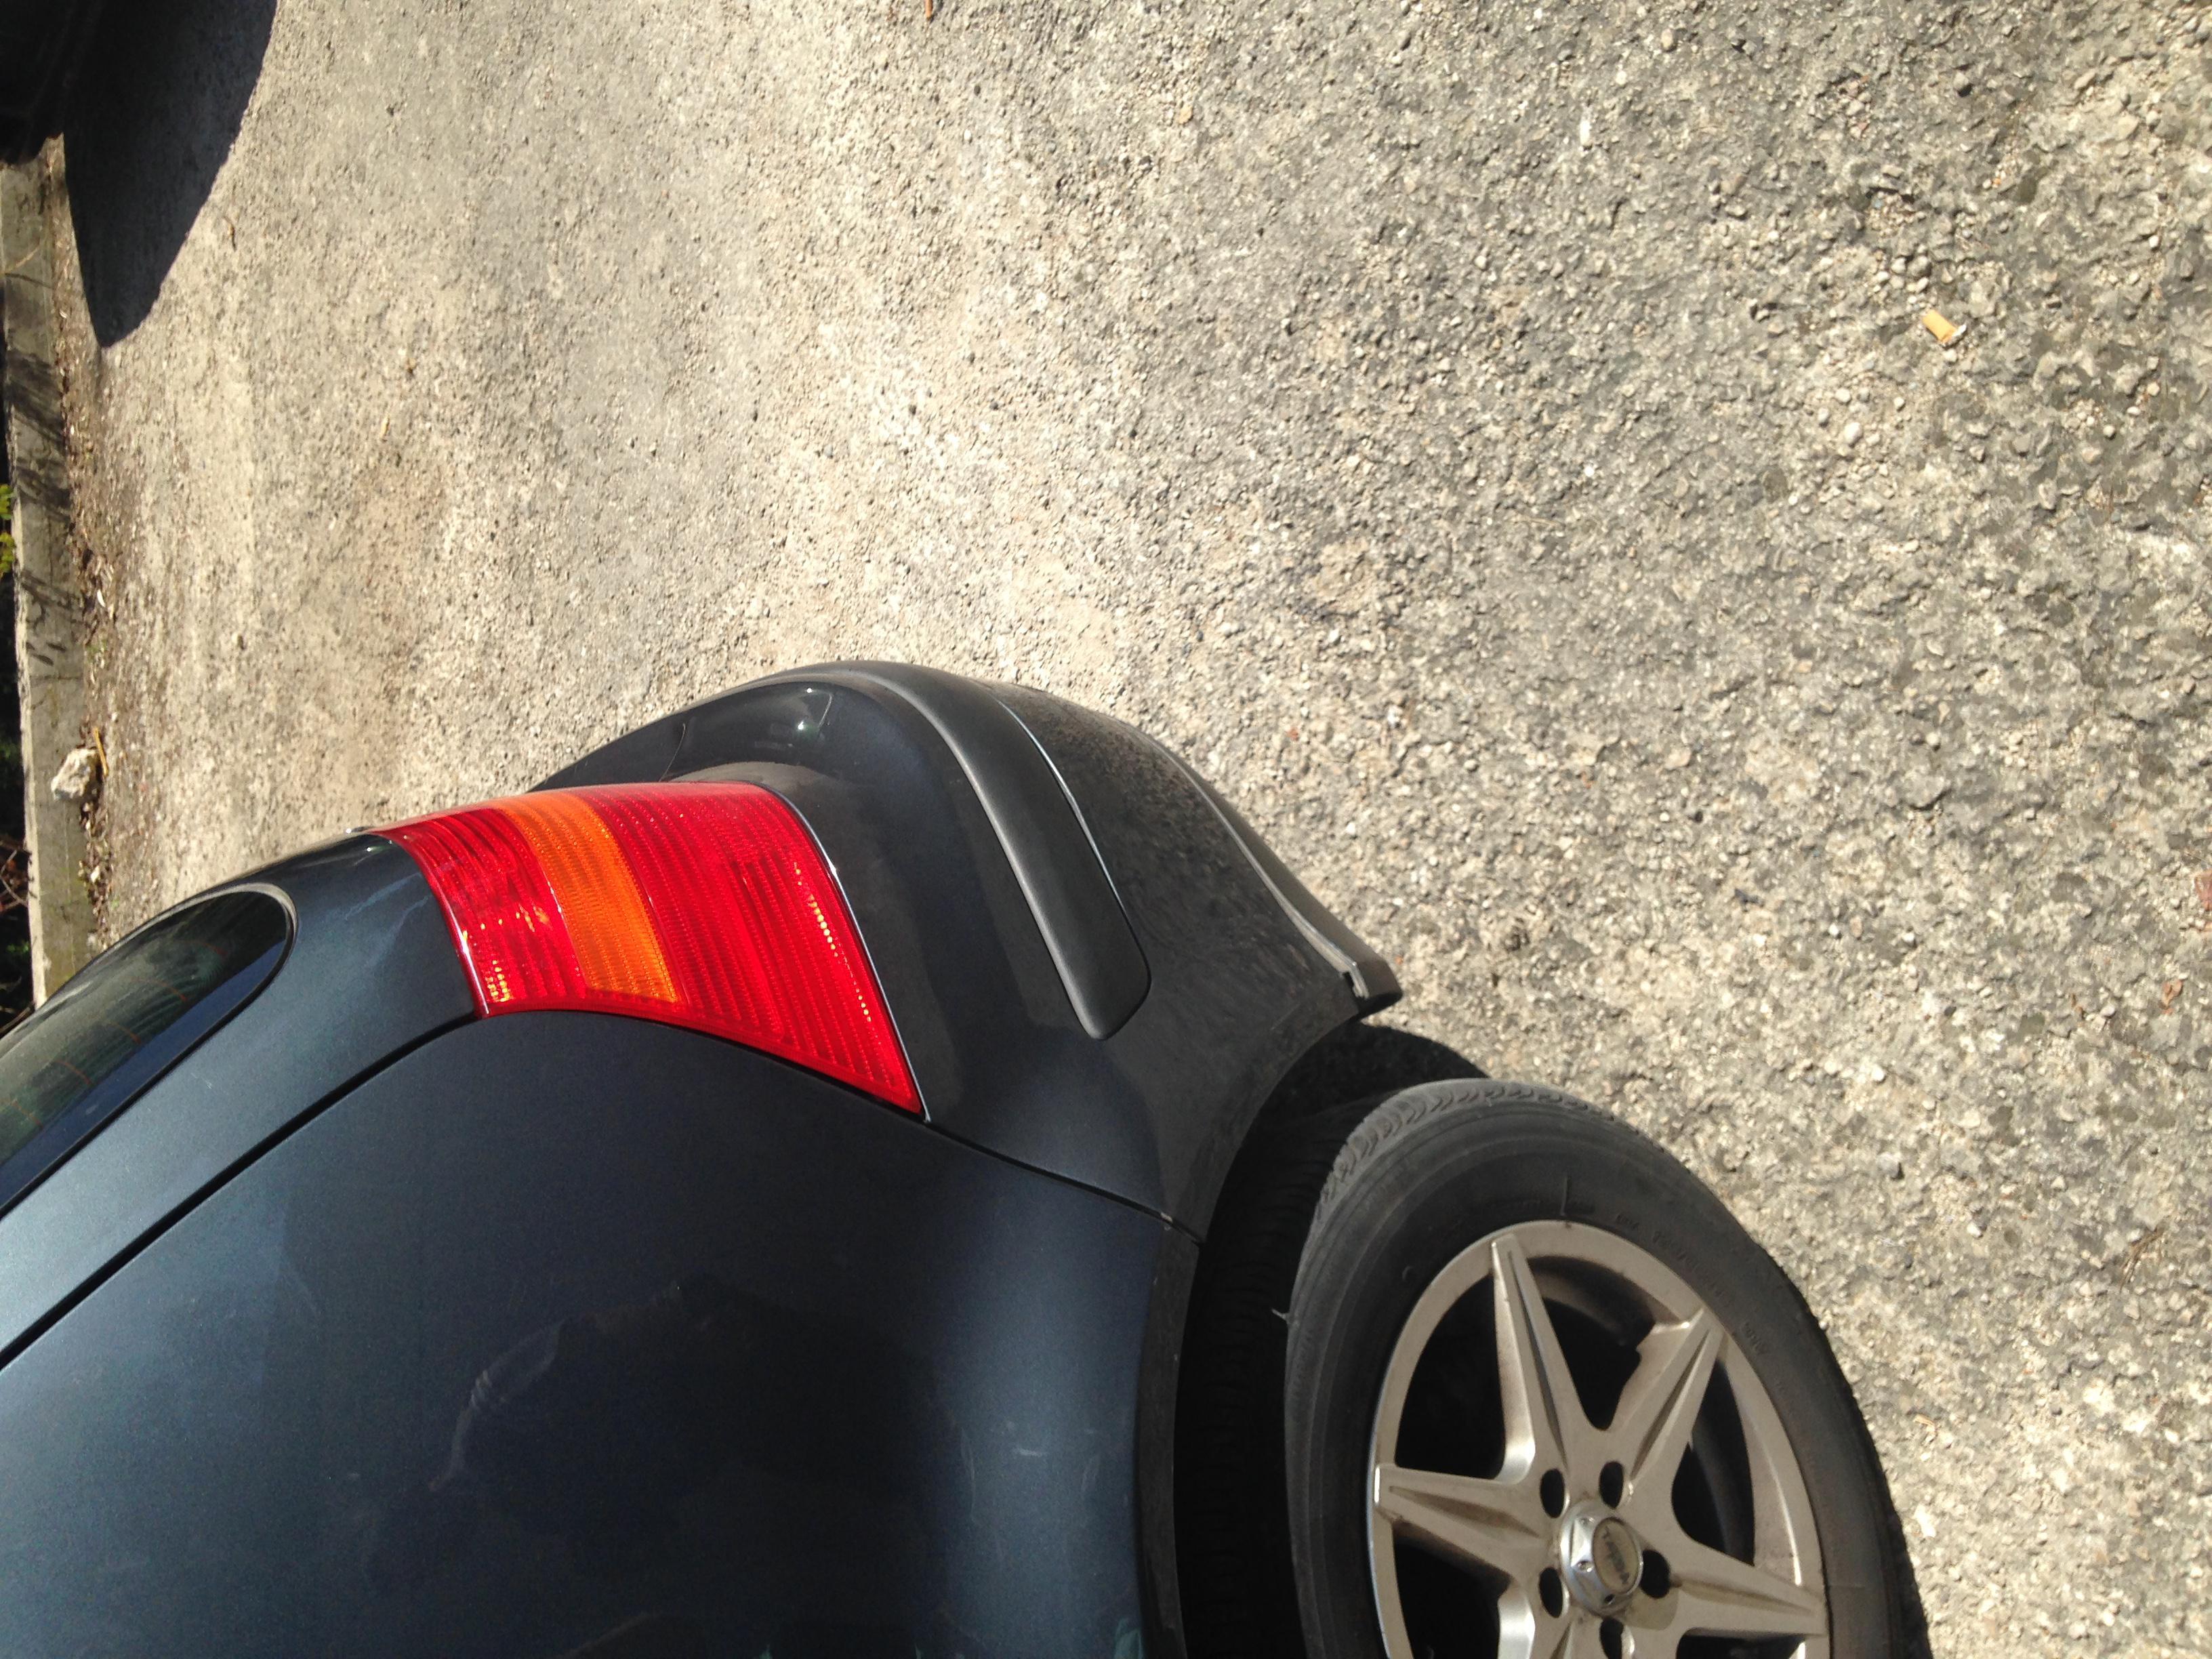 Vw golf iv tdi 110 up photo apr s accrochage for Volkswagen meaux garage